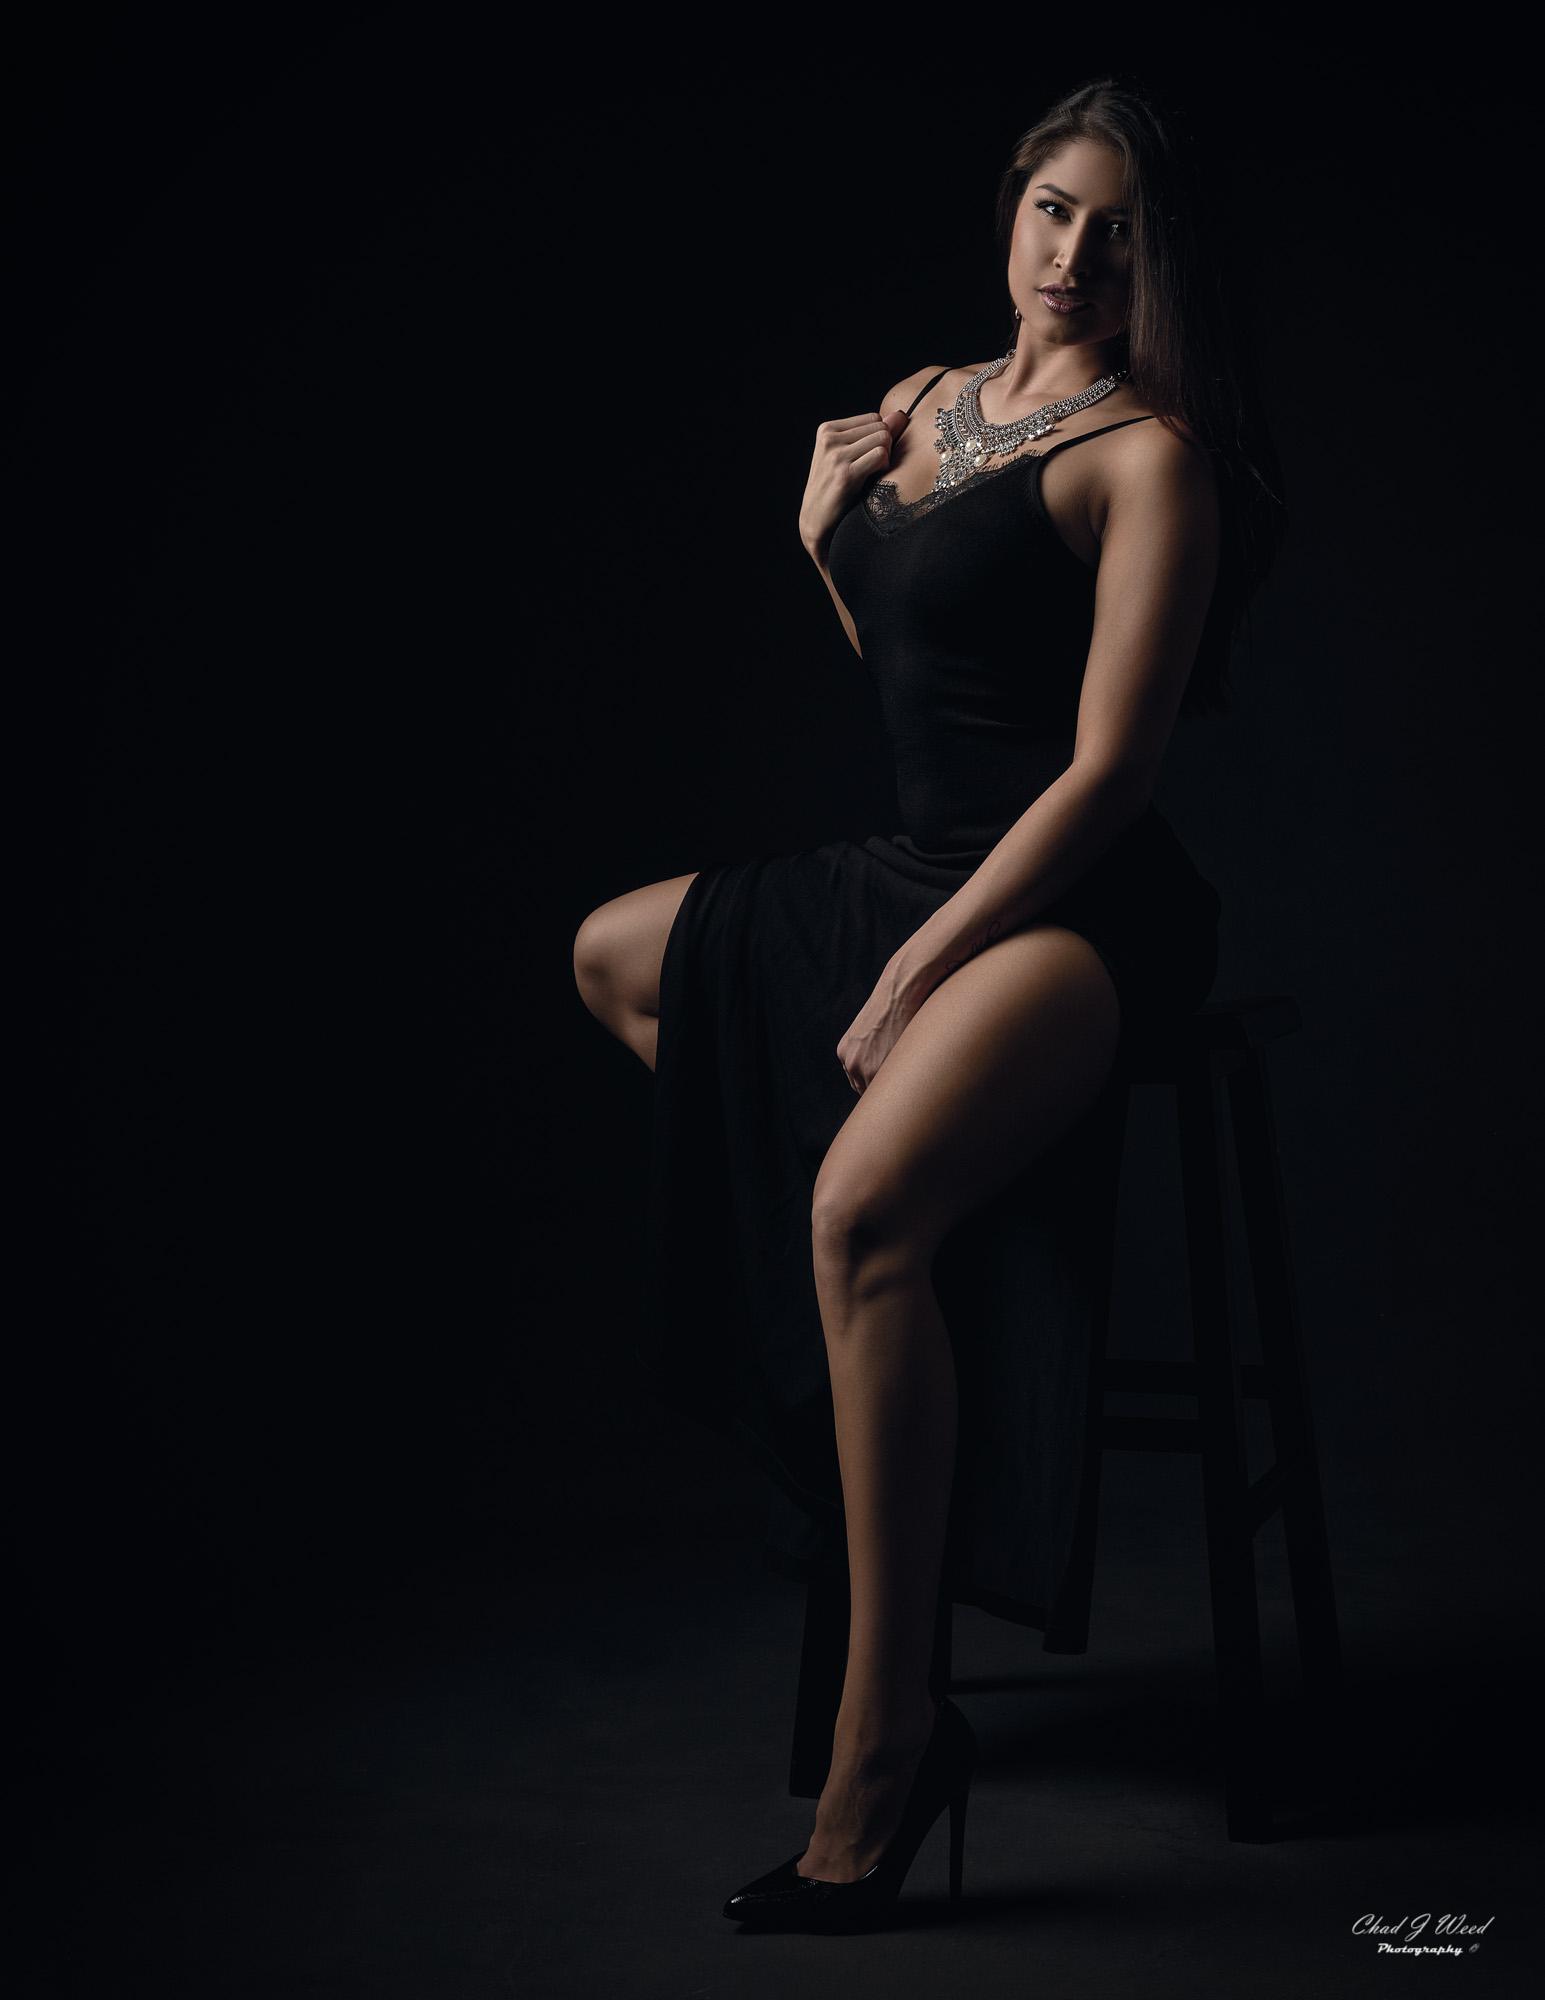 Arizona Fashion Photographer Chad Weed with Fitness Model Ashly - Black Dress 1